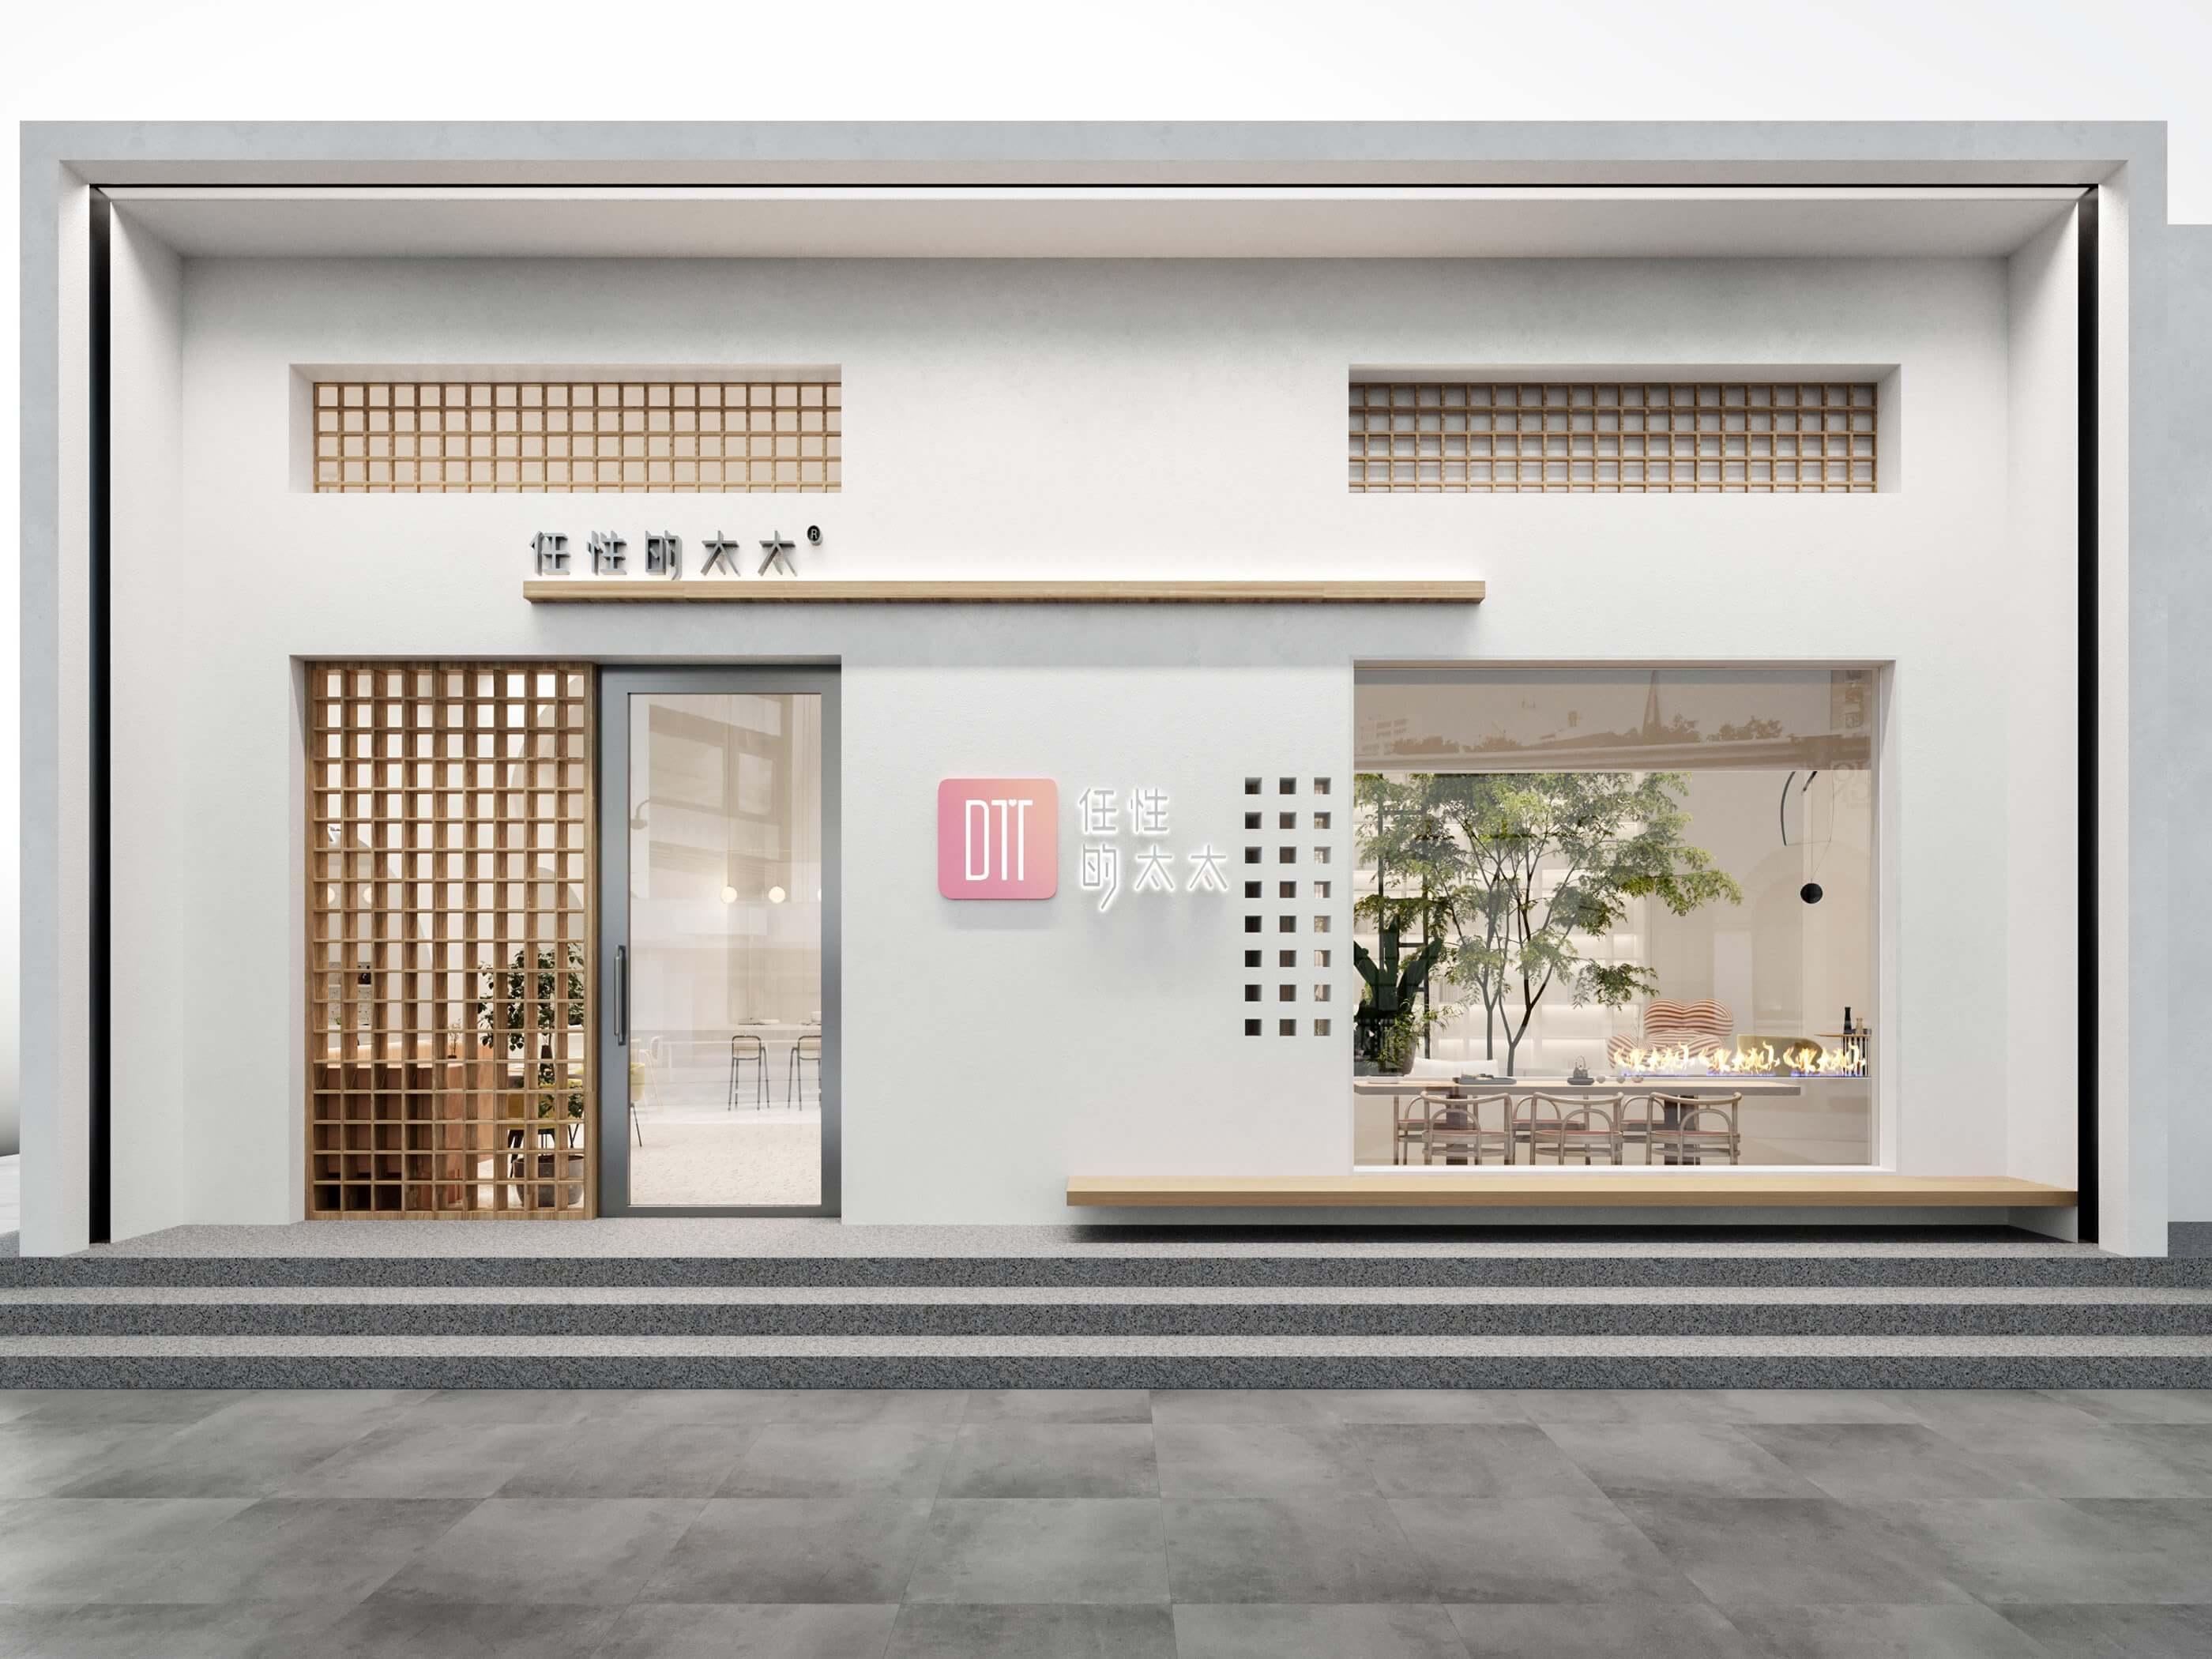 Modern bar restaurant design front outside - cgi visualization